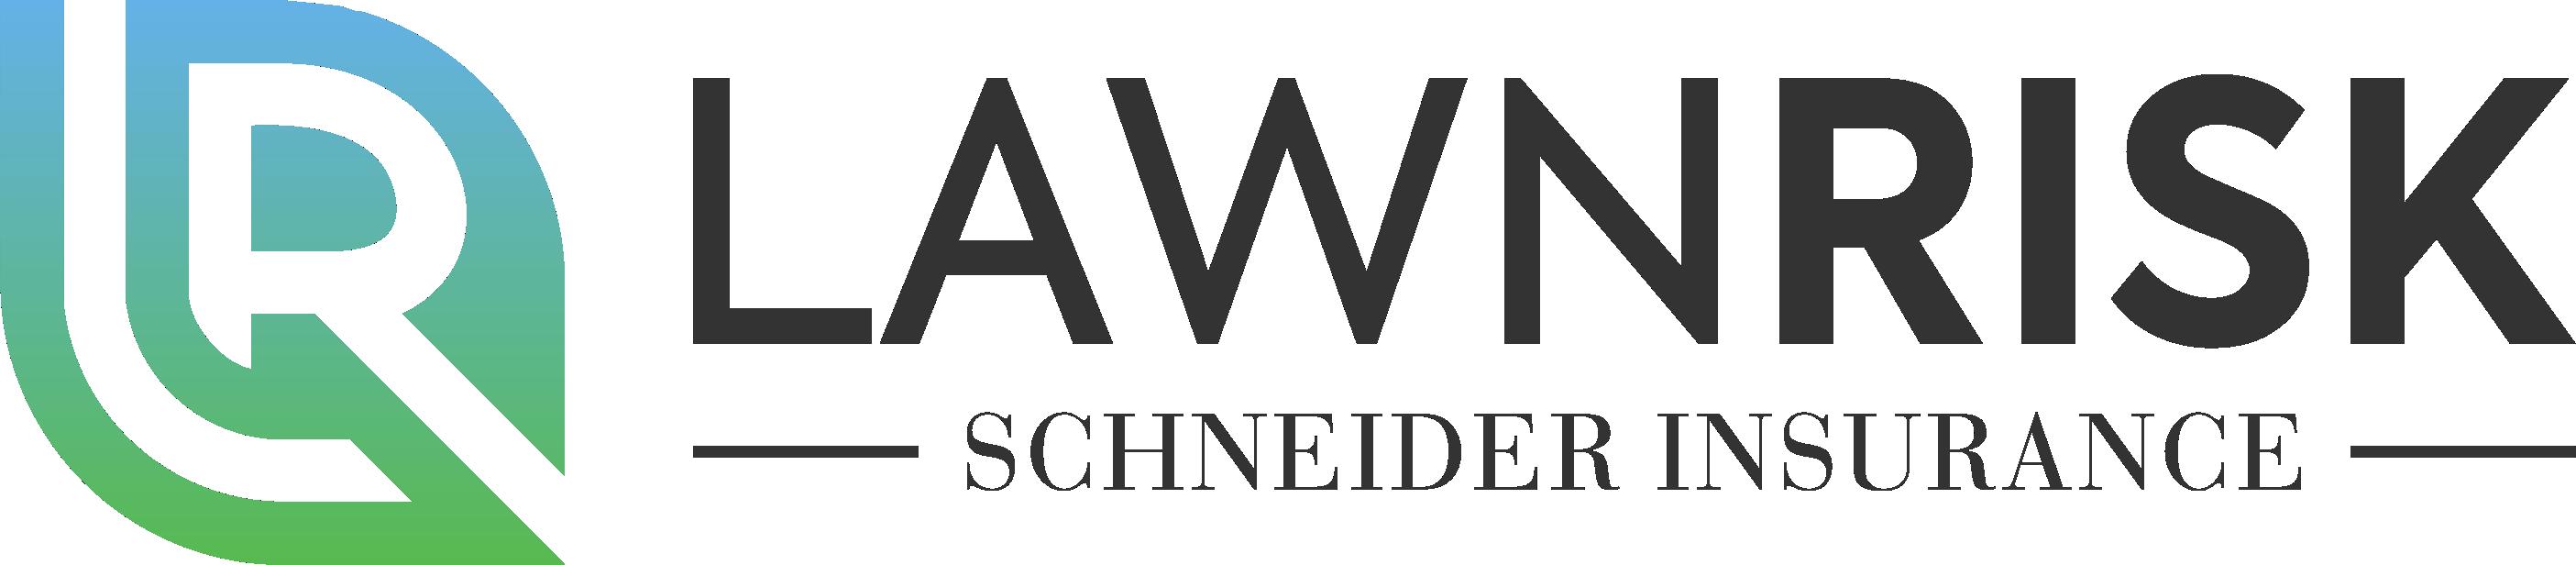 Lawnrisk logo design